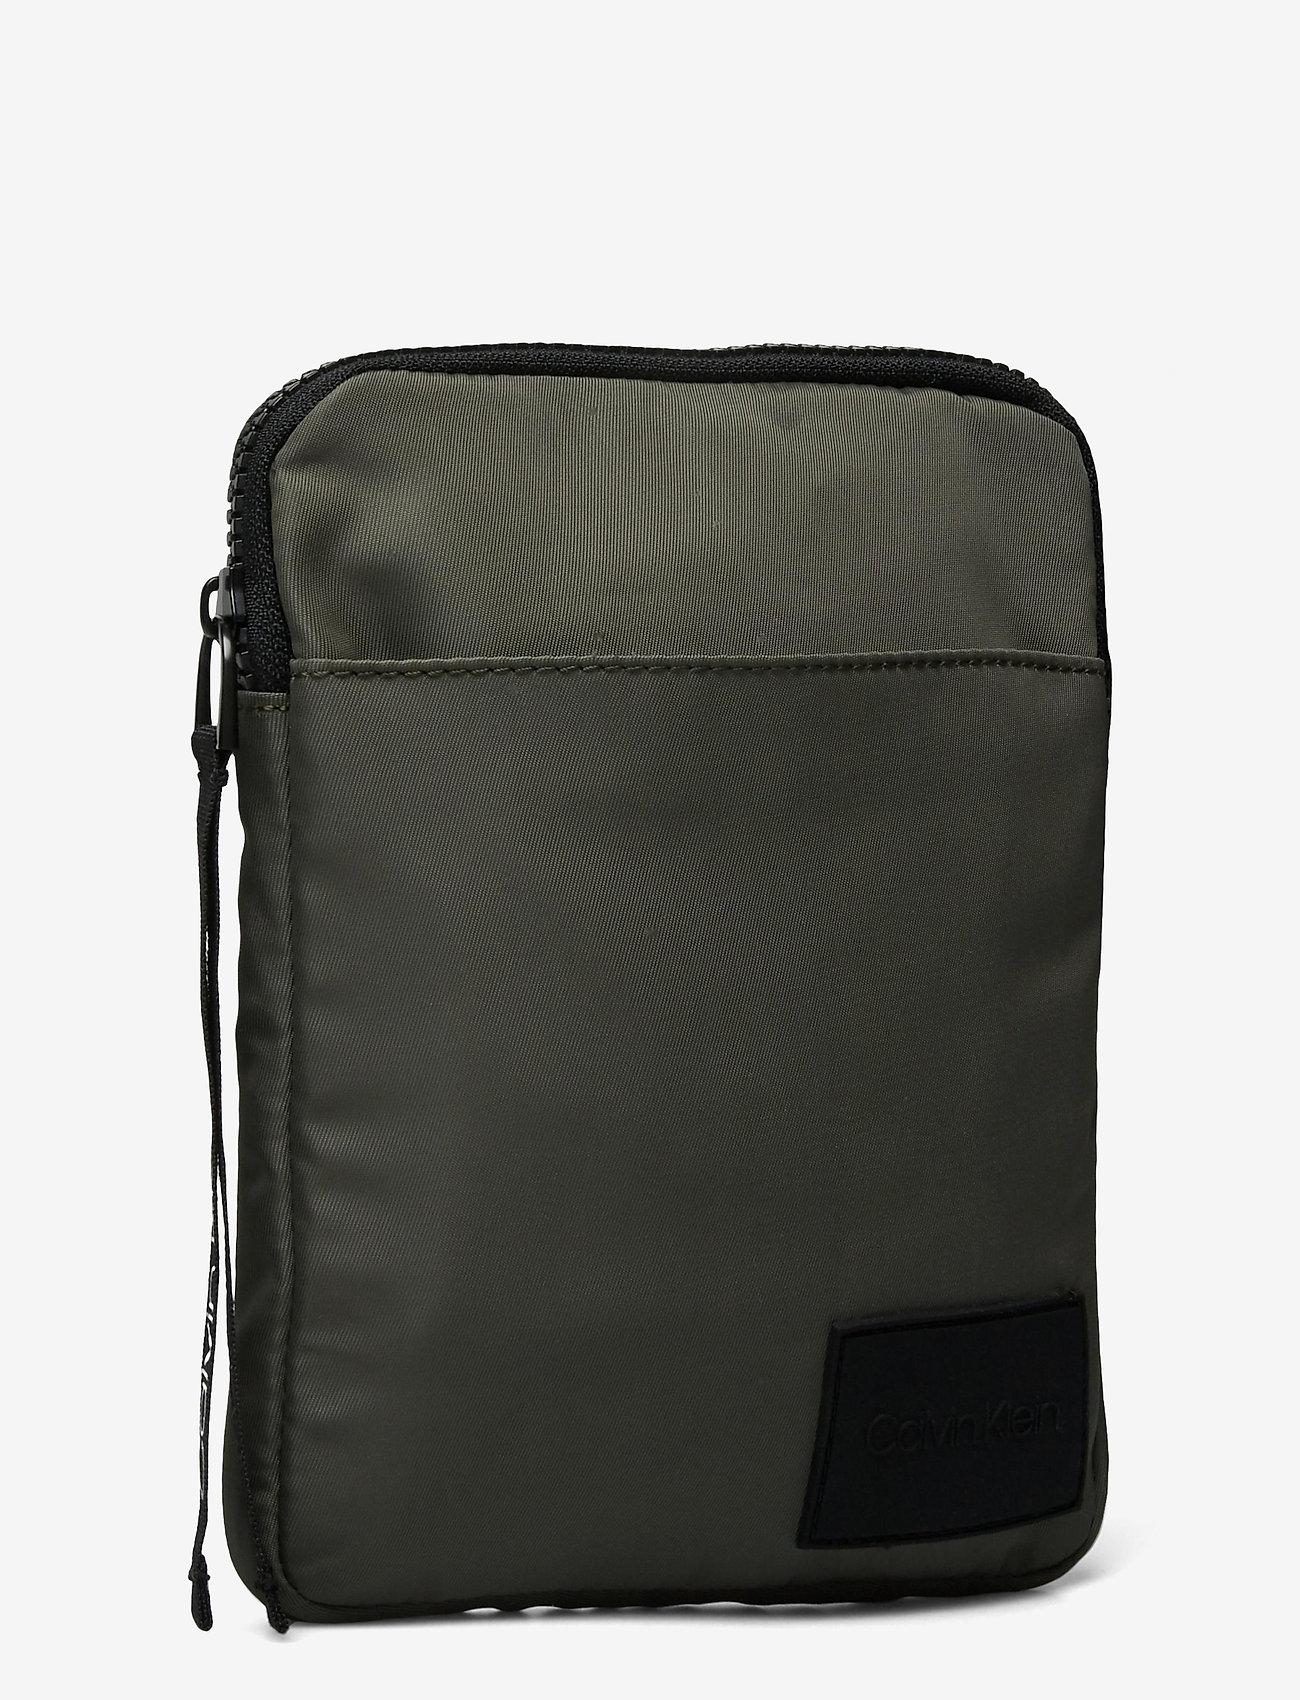 Calvin Klein - FLAT PACK S - shoulder bags - dark olive - 2